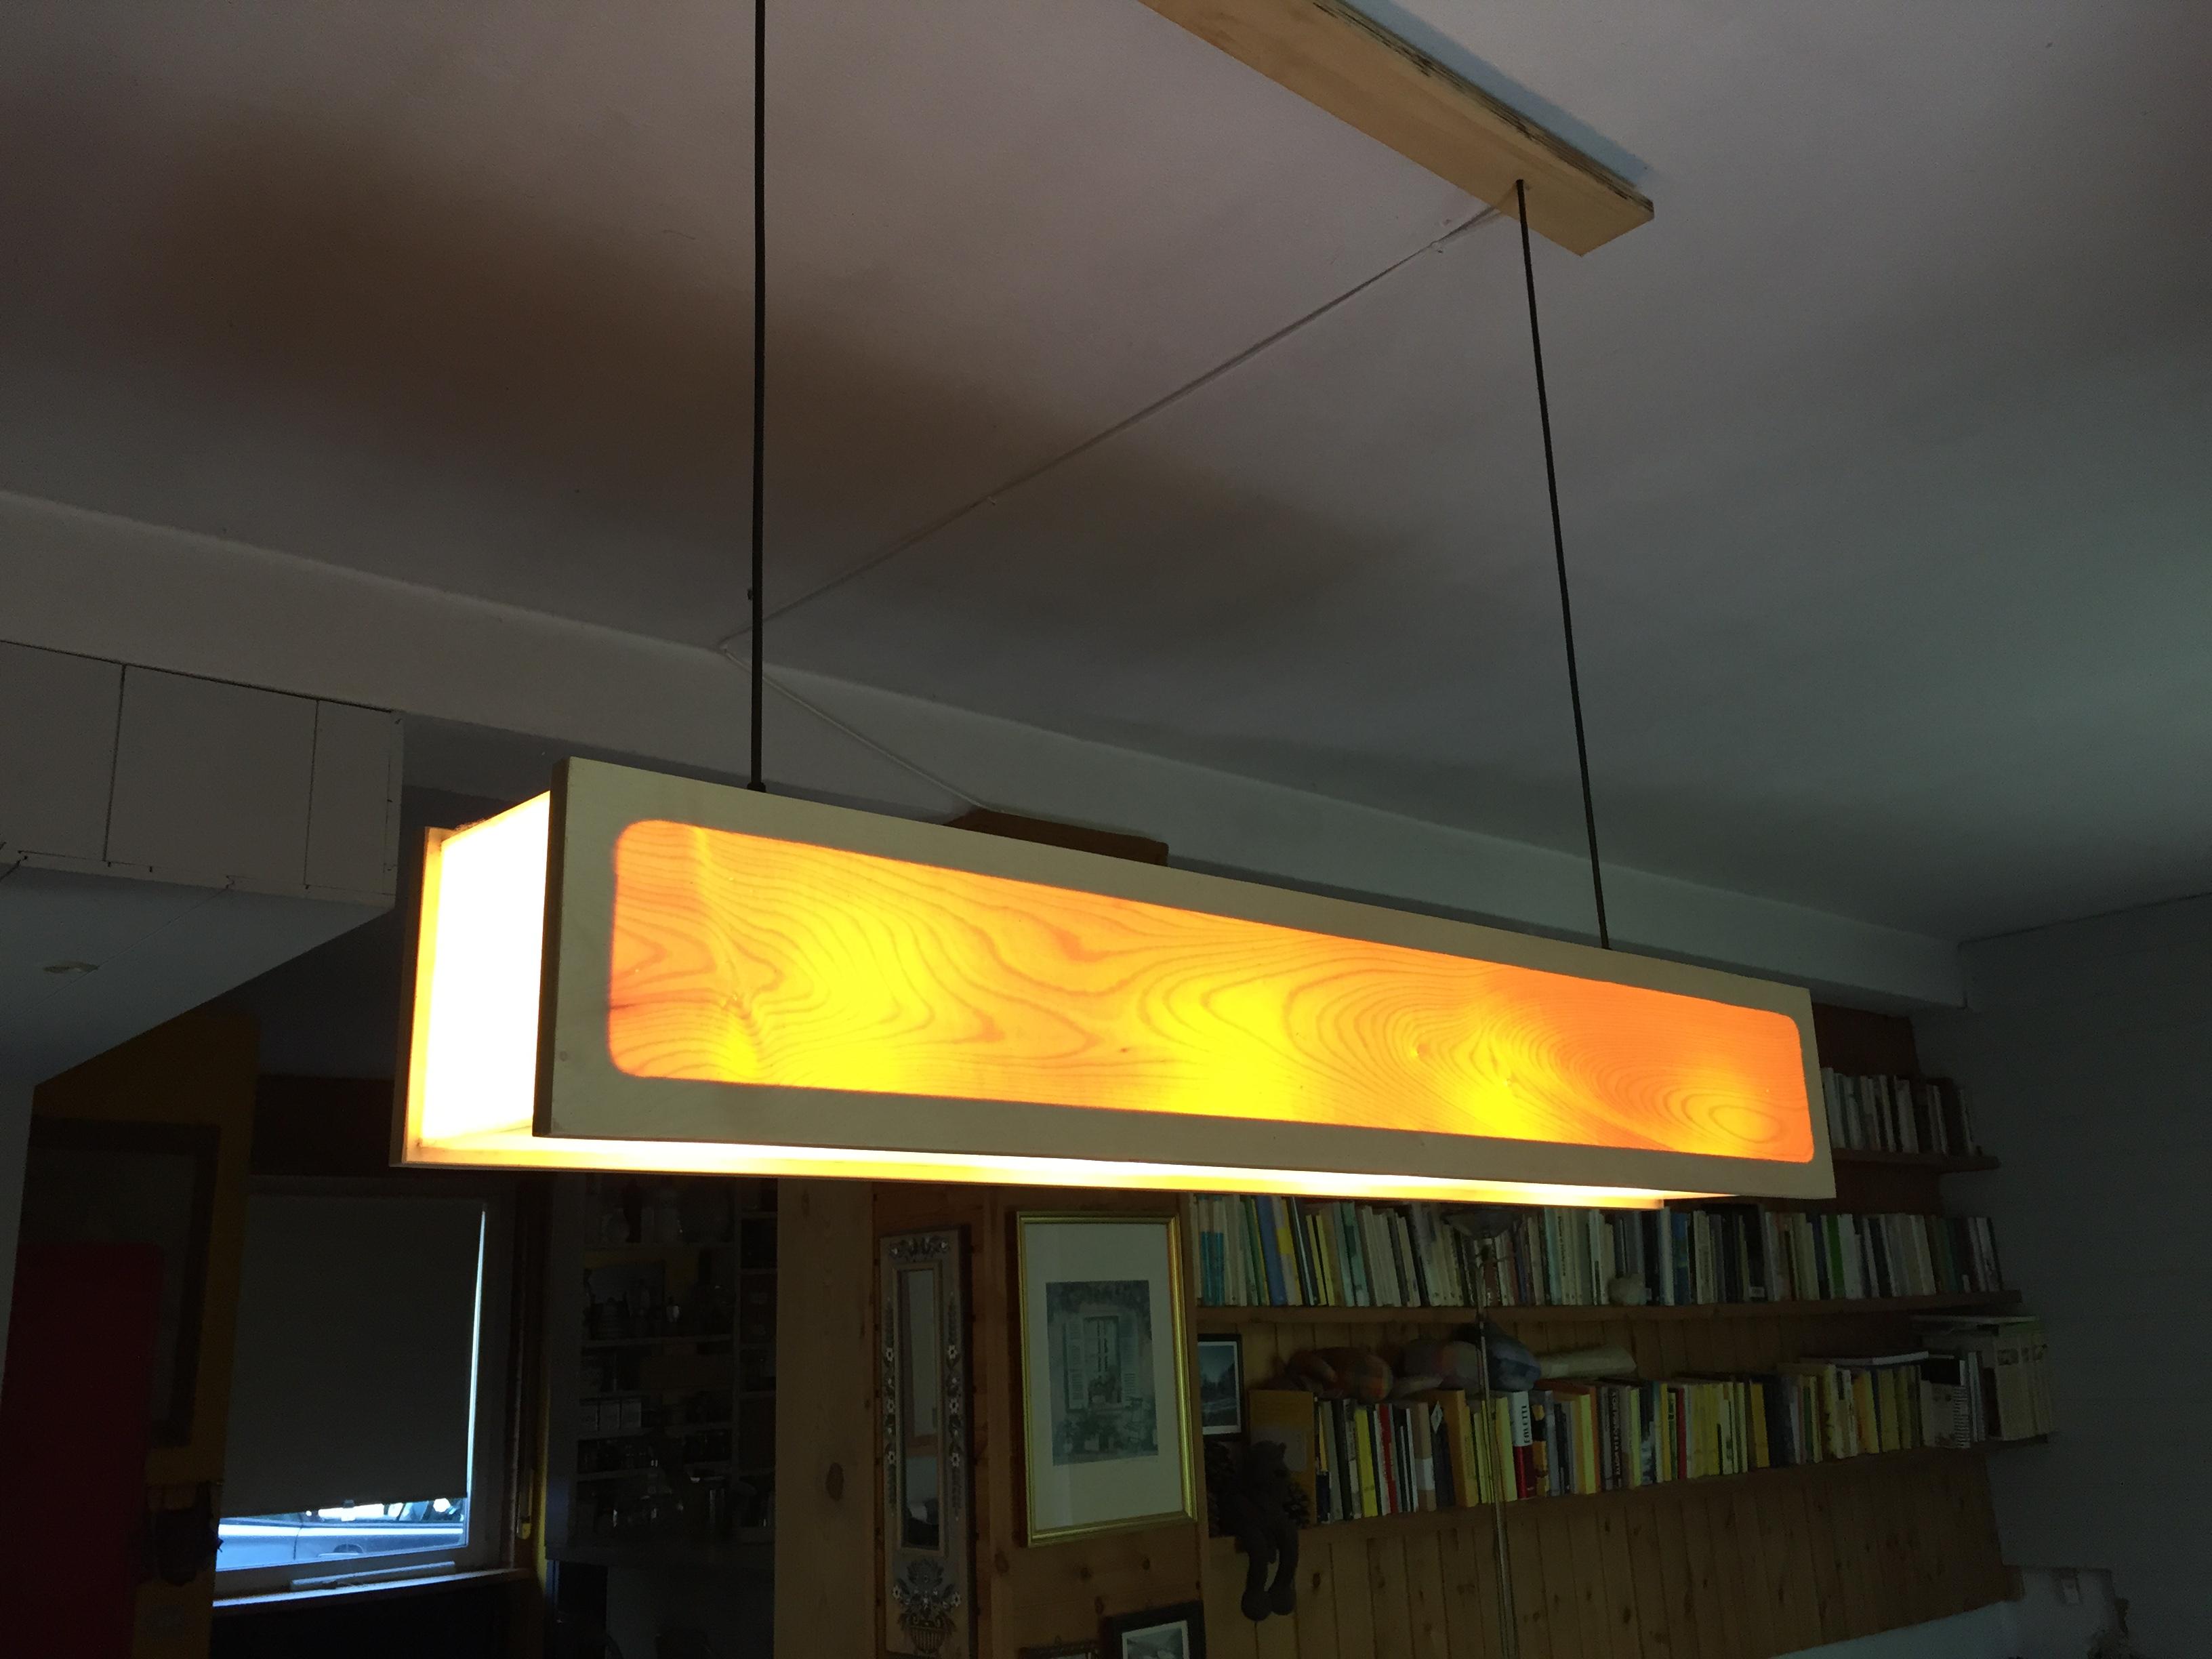 Lampada N°8.0.1